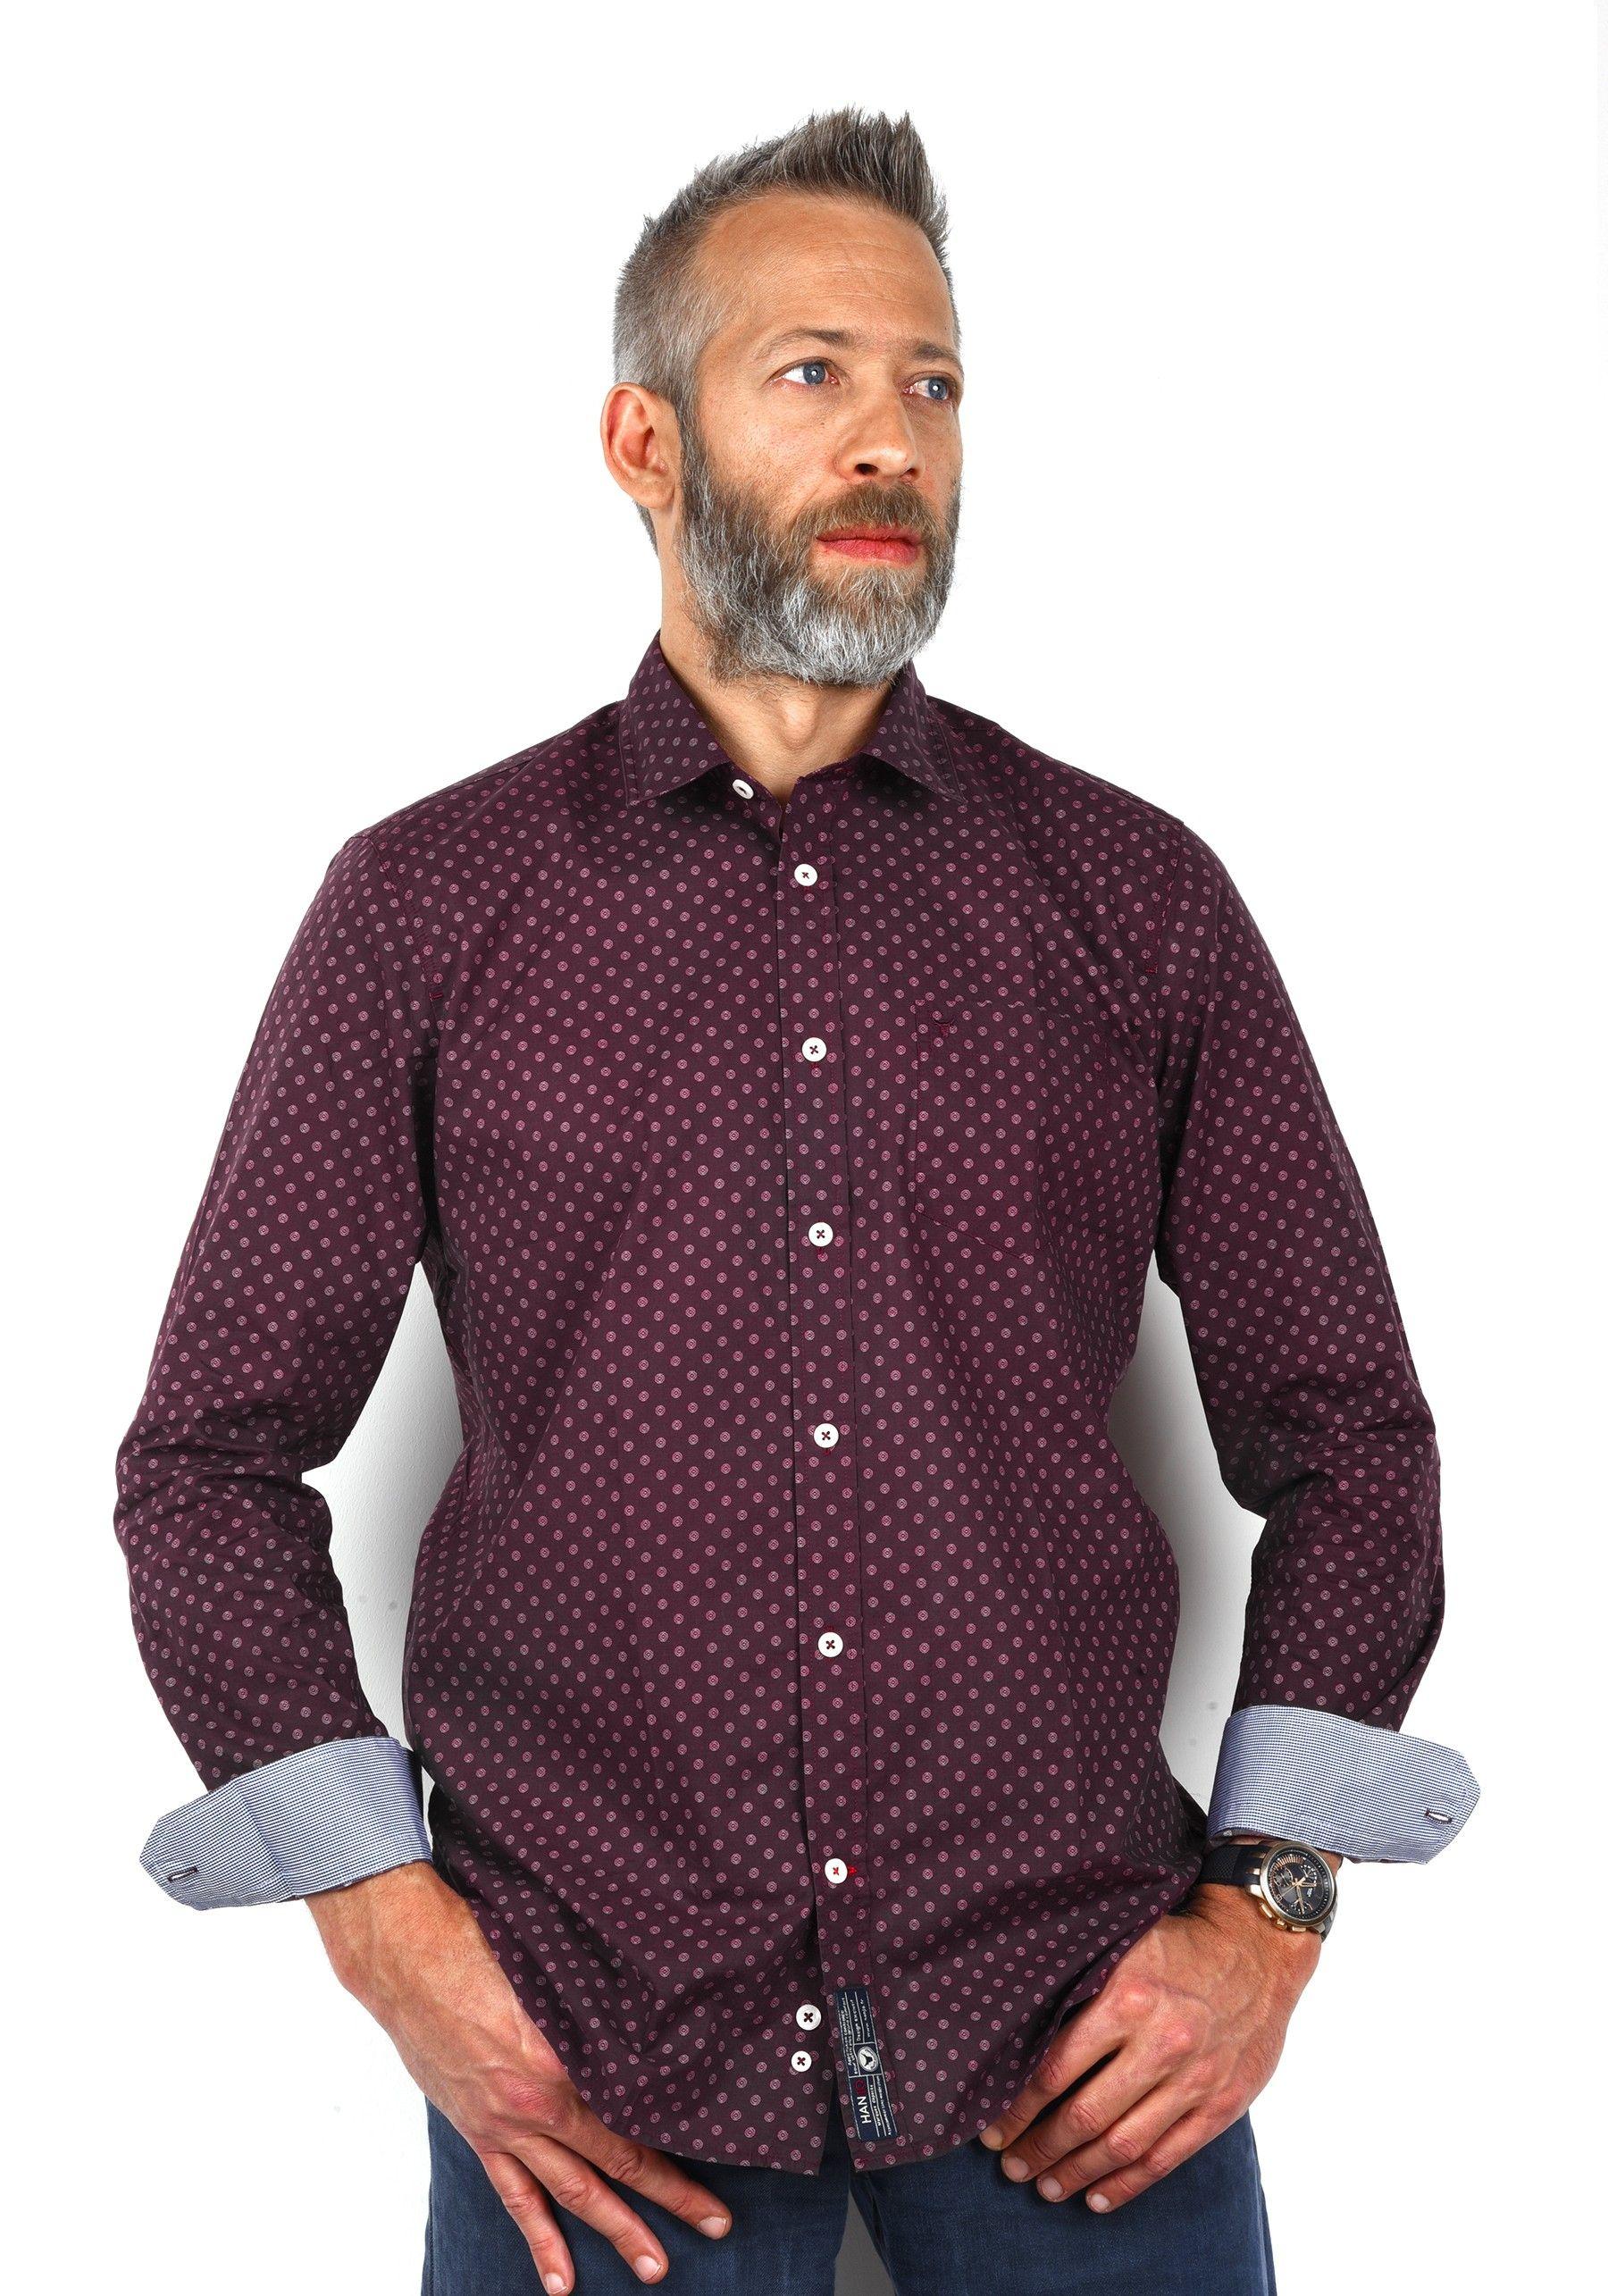 chemise mode homme rouge bordeaux motif imprim pois. Black Bedroom Furniture Sets. Home Design Ideas